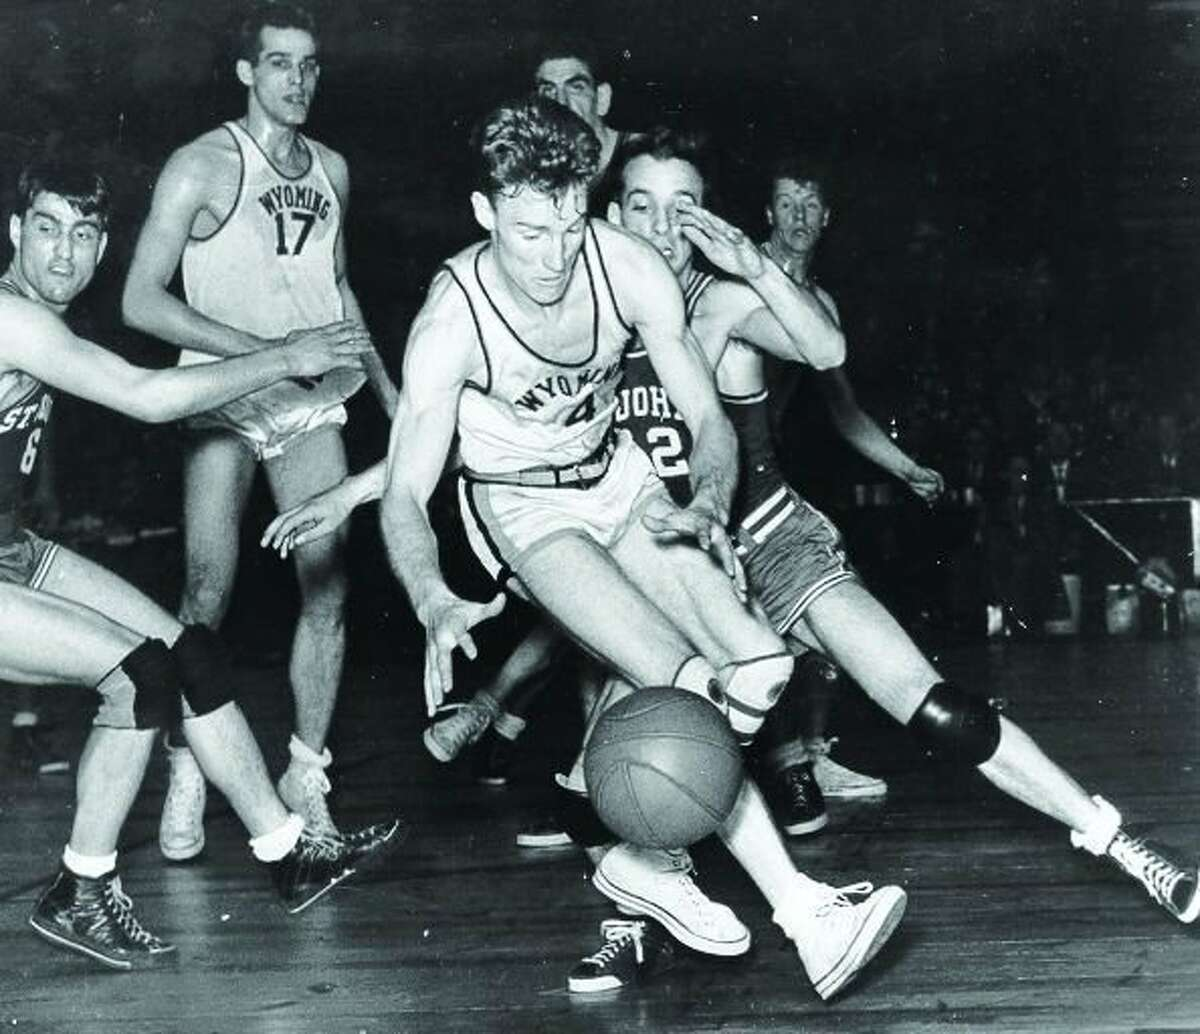 Wyoming's Kenny Sailors dribbles against St. John's on April 1, 1943.